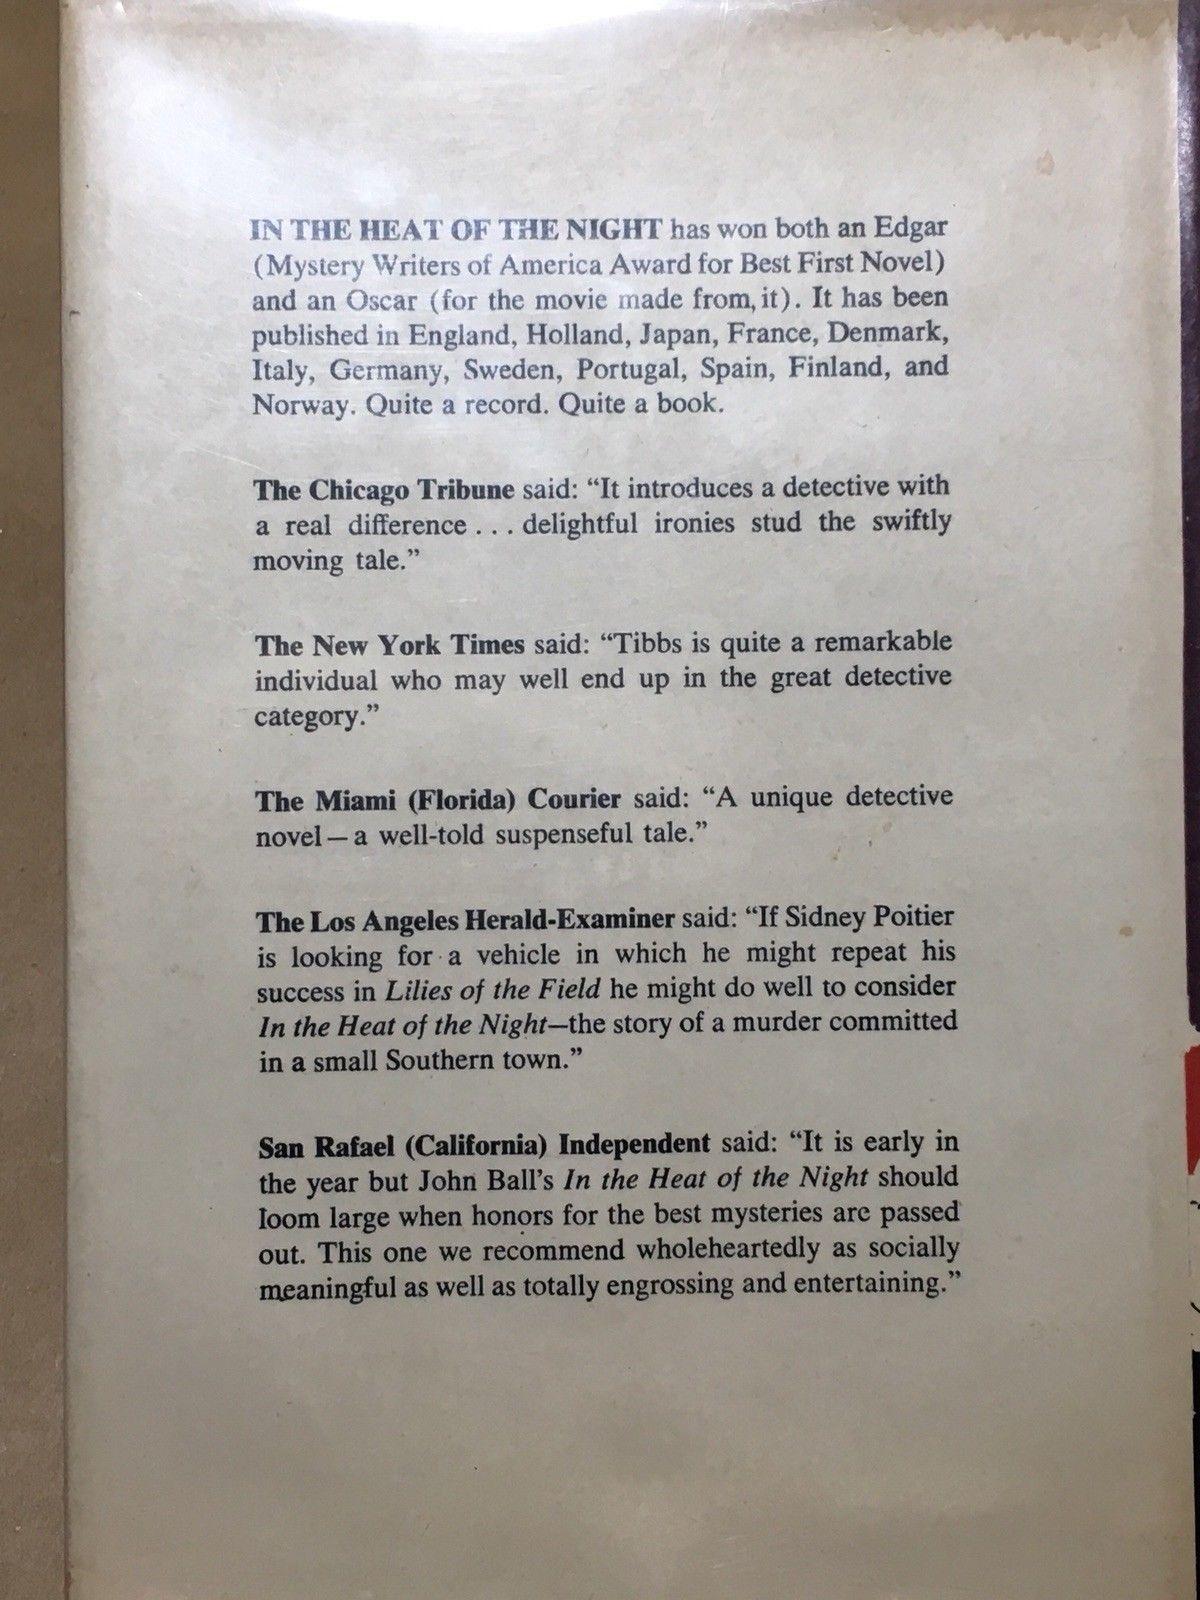 IN THE HEAT OF THE NIGHT - John Ball Inscribed First Taiwan Ed. Virgil Tibbs